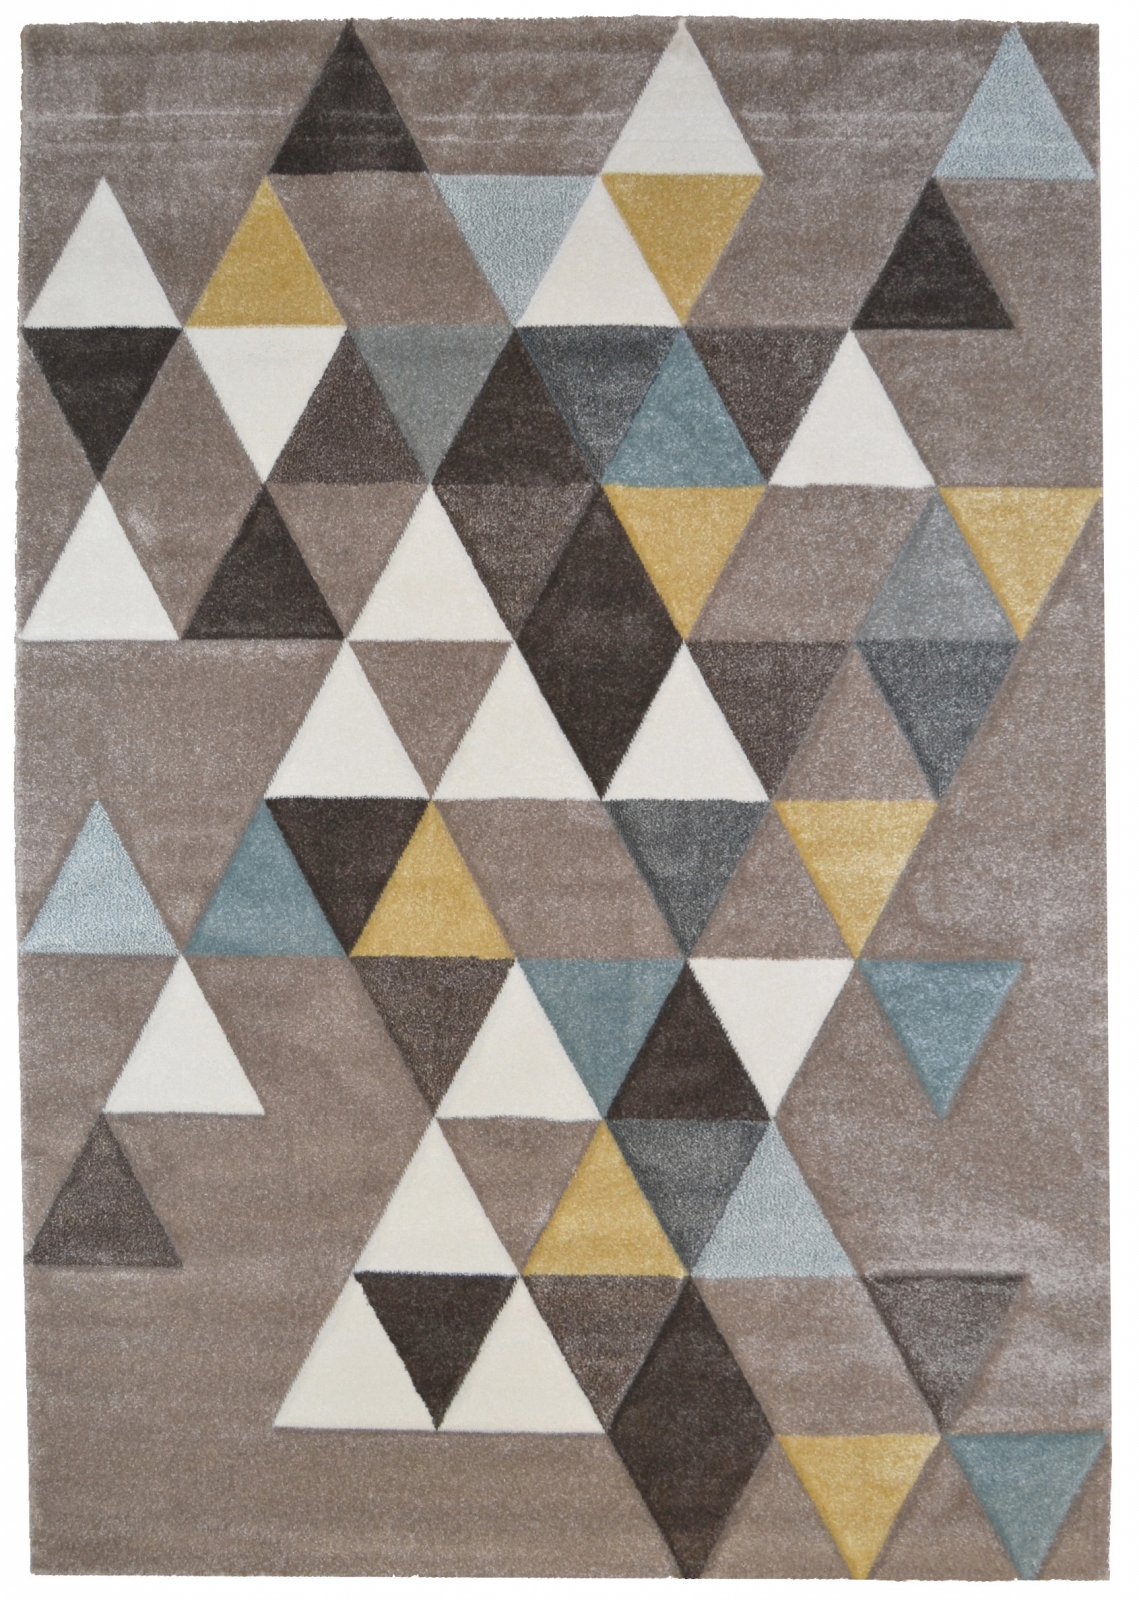 4292-tapis-ella-500-triangle-beige-200x2